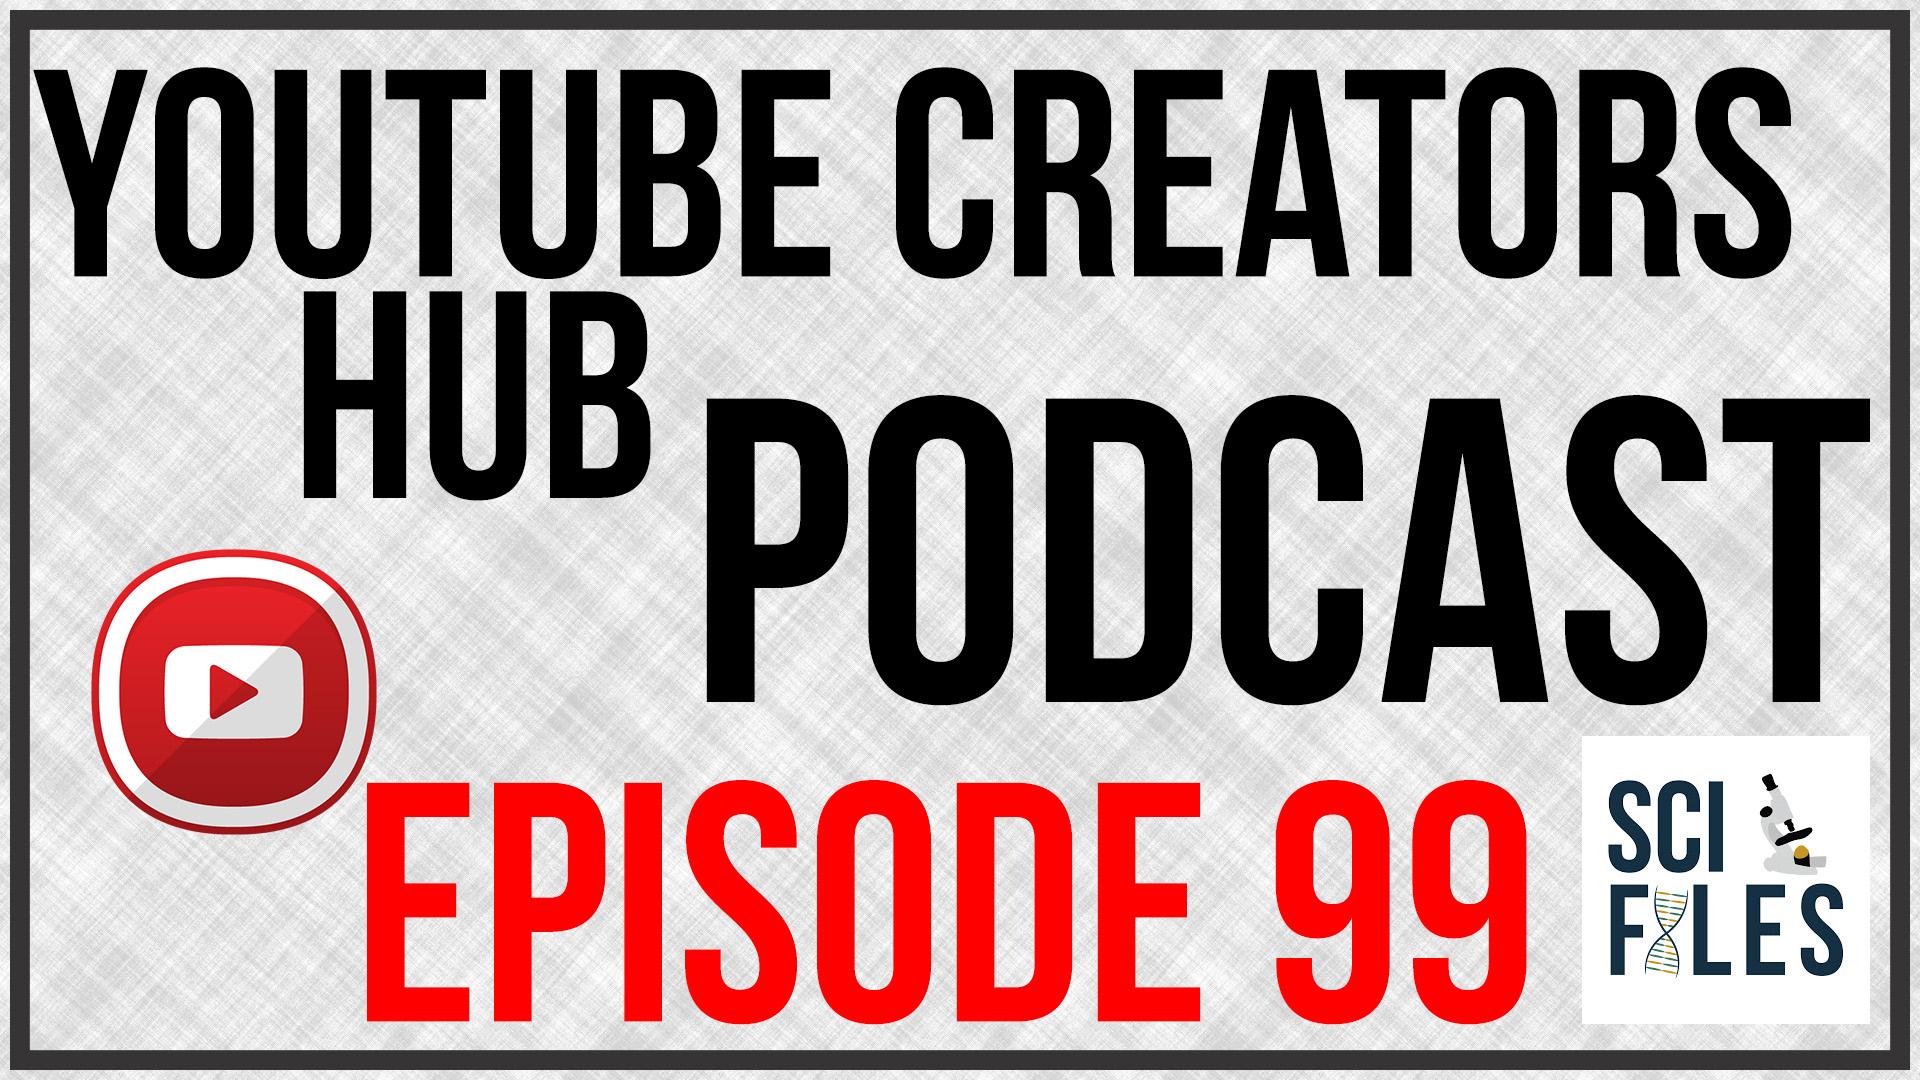 YTCH Podcast Episode 99